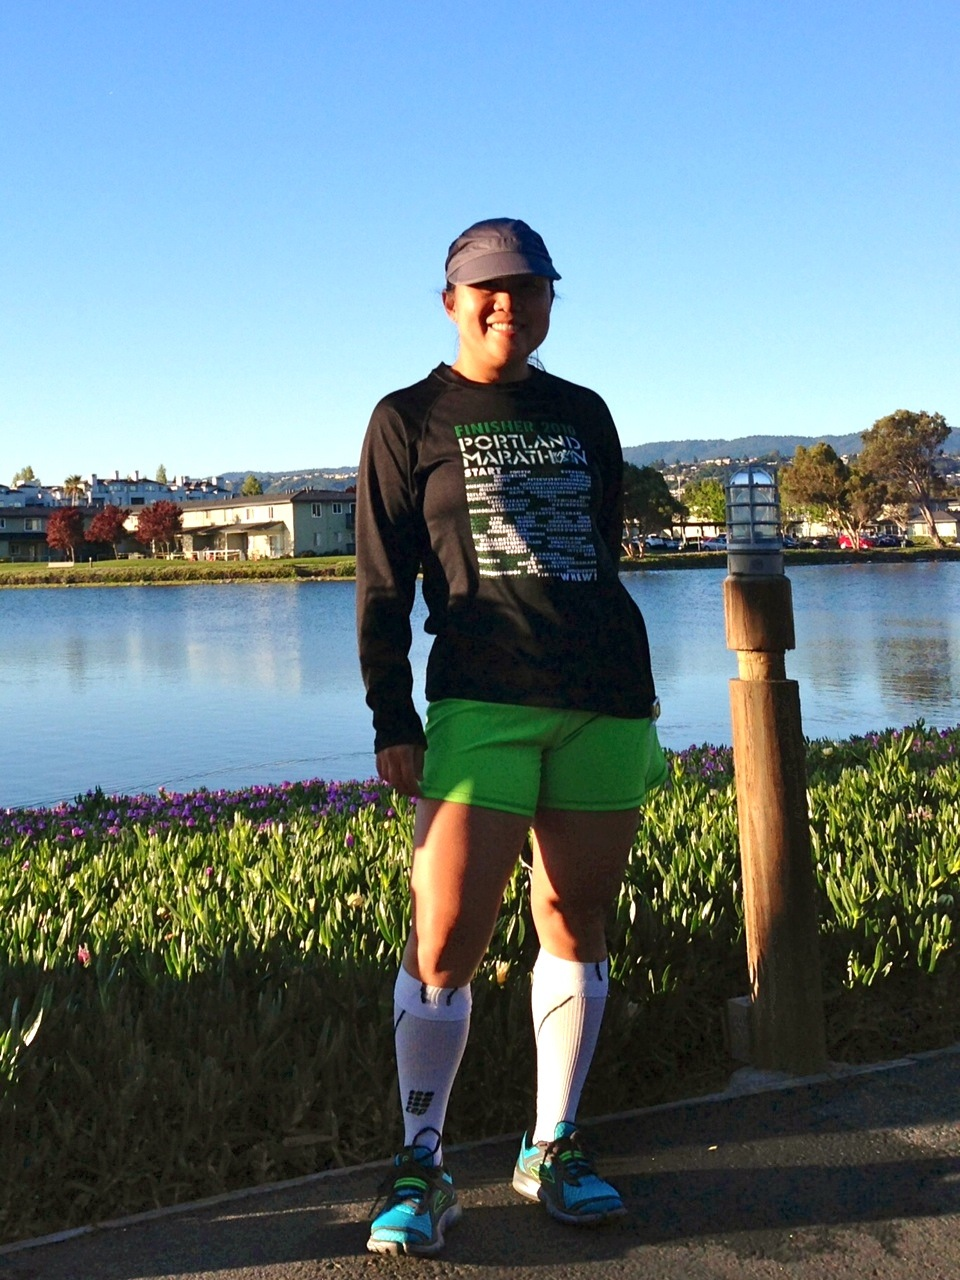 Wearing the race shirt of my favorite marathon that I've run (so far!).